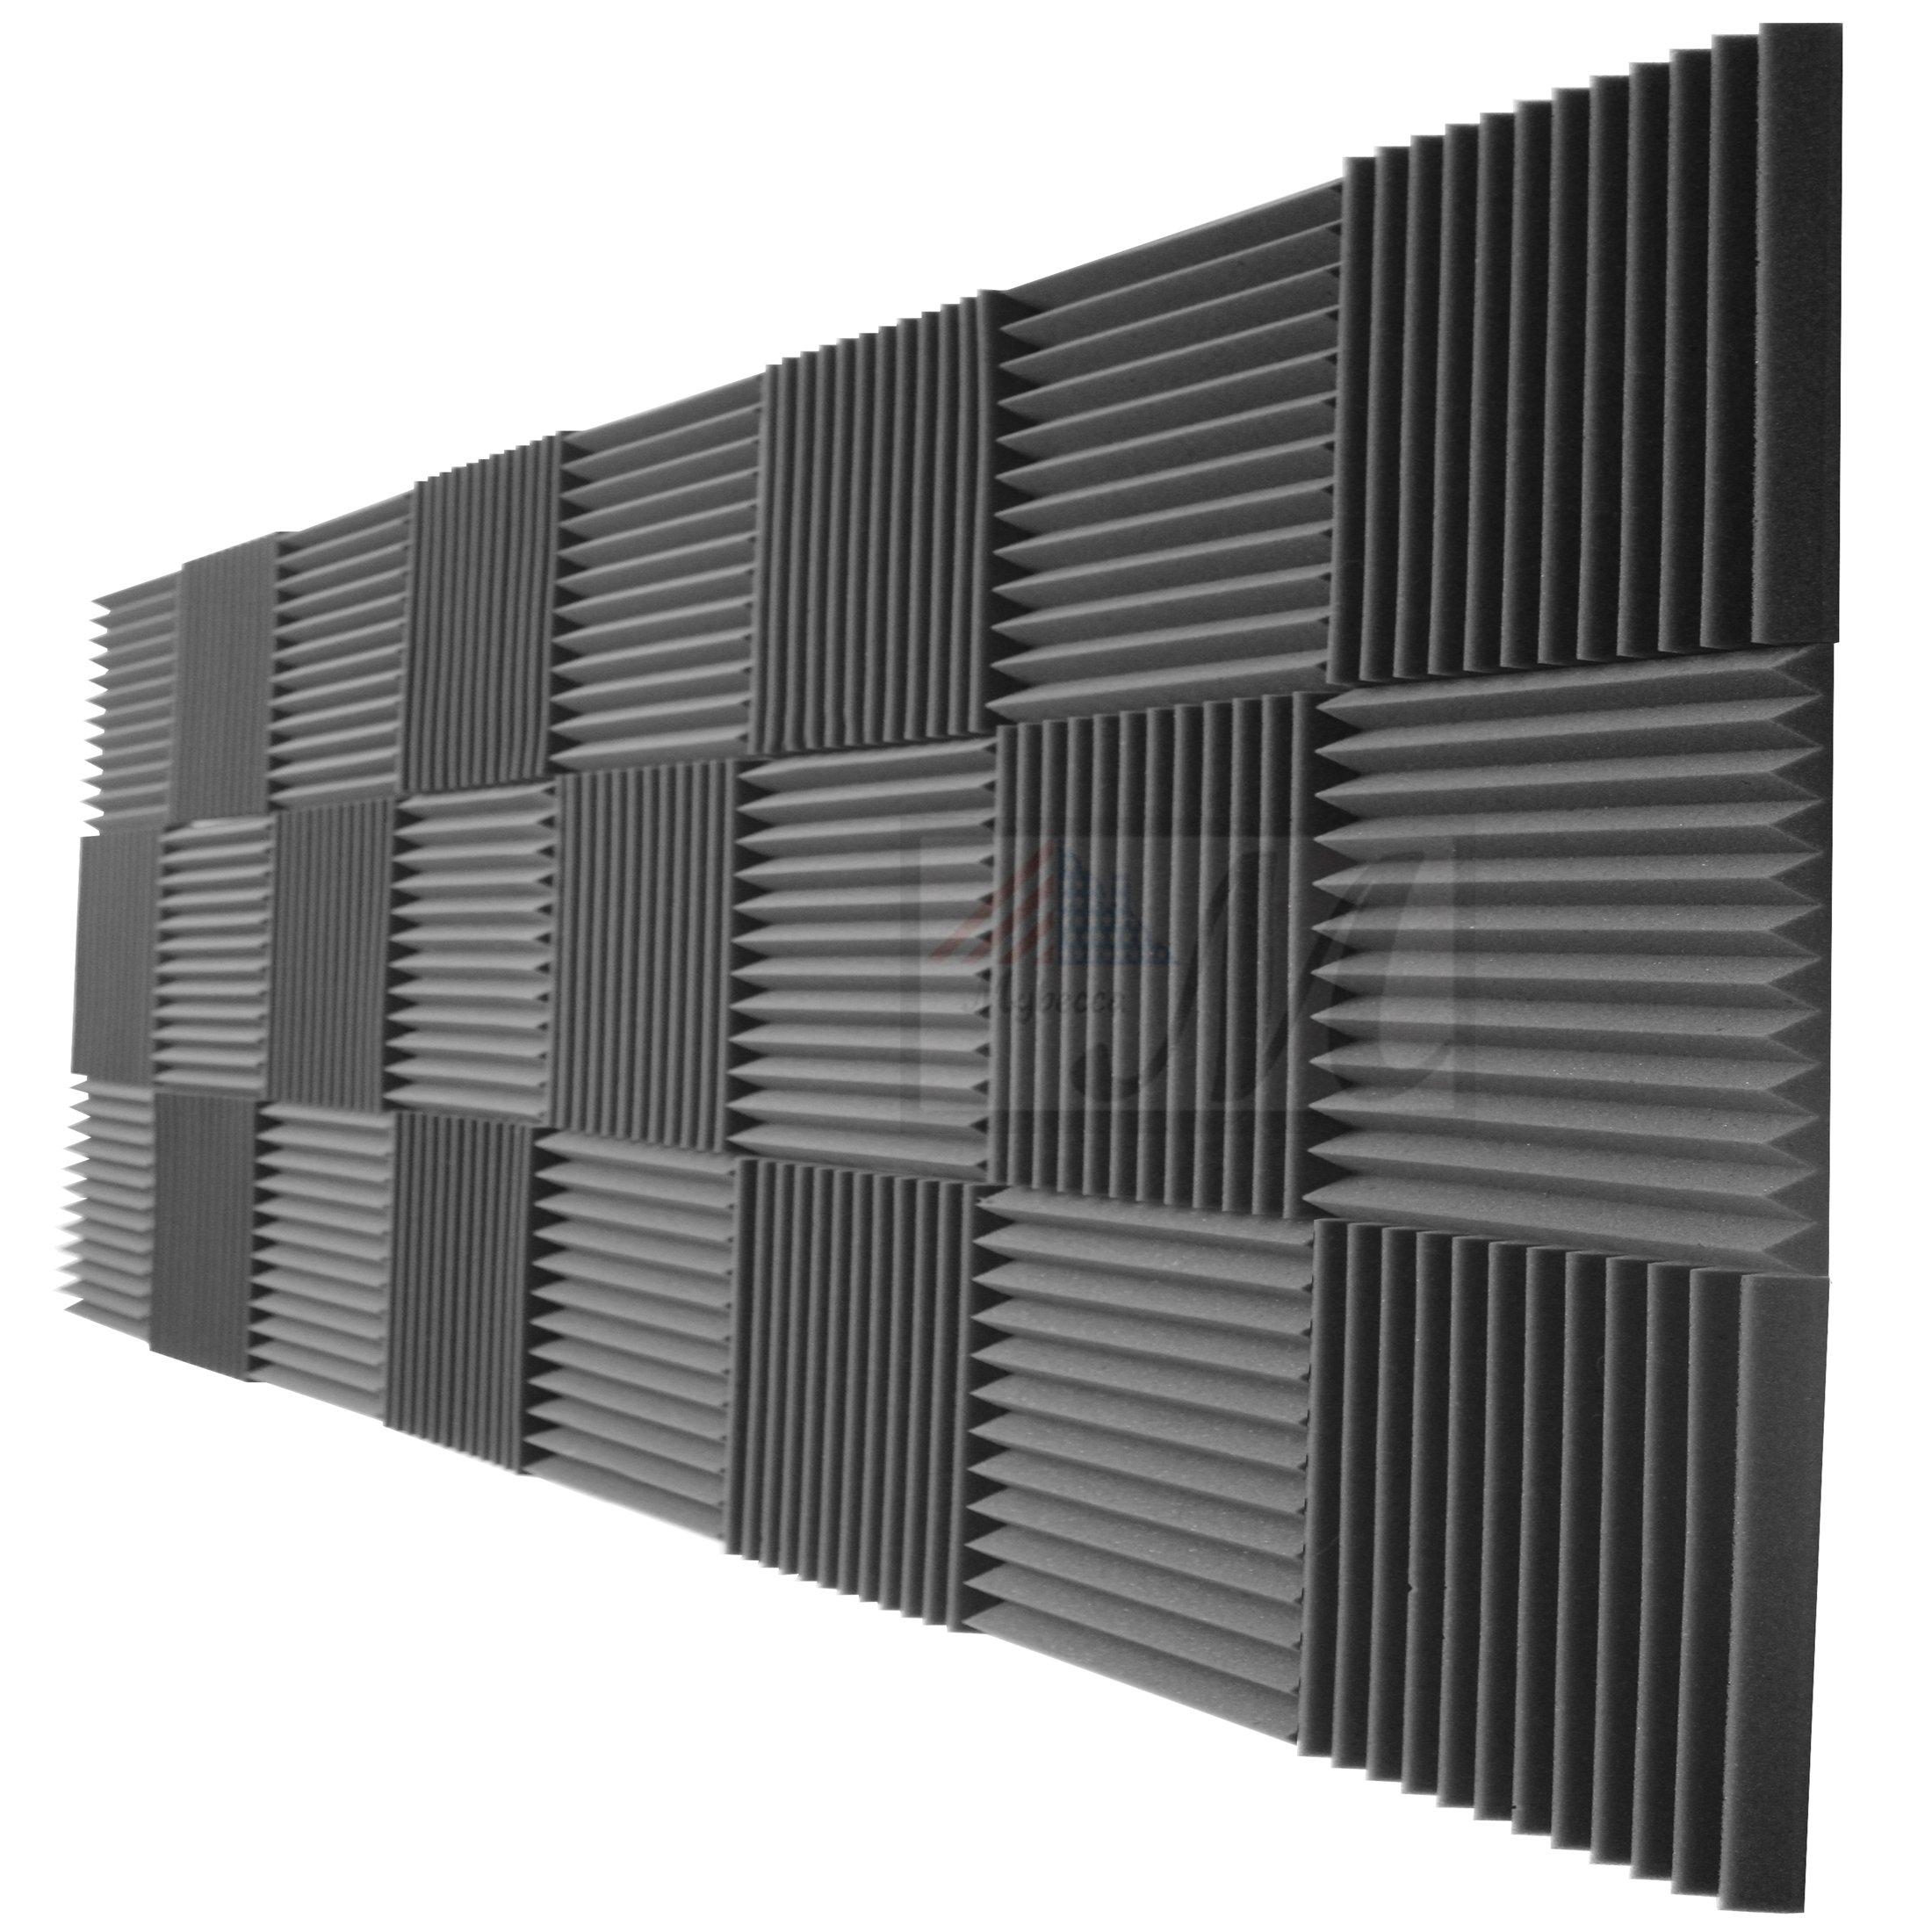 Mybecca 24 Pack Acoustic Foam Panels 2'' X 12'' X 12'' Studio Soundproofing Wedges (24 Square Feet), Charcoal